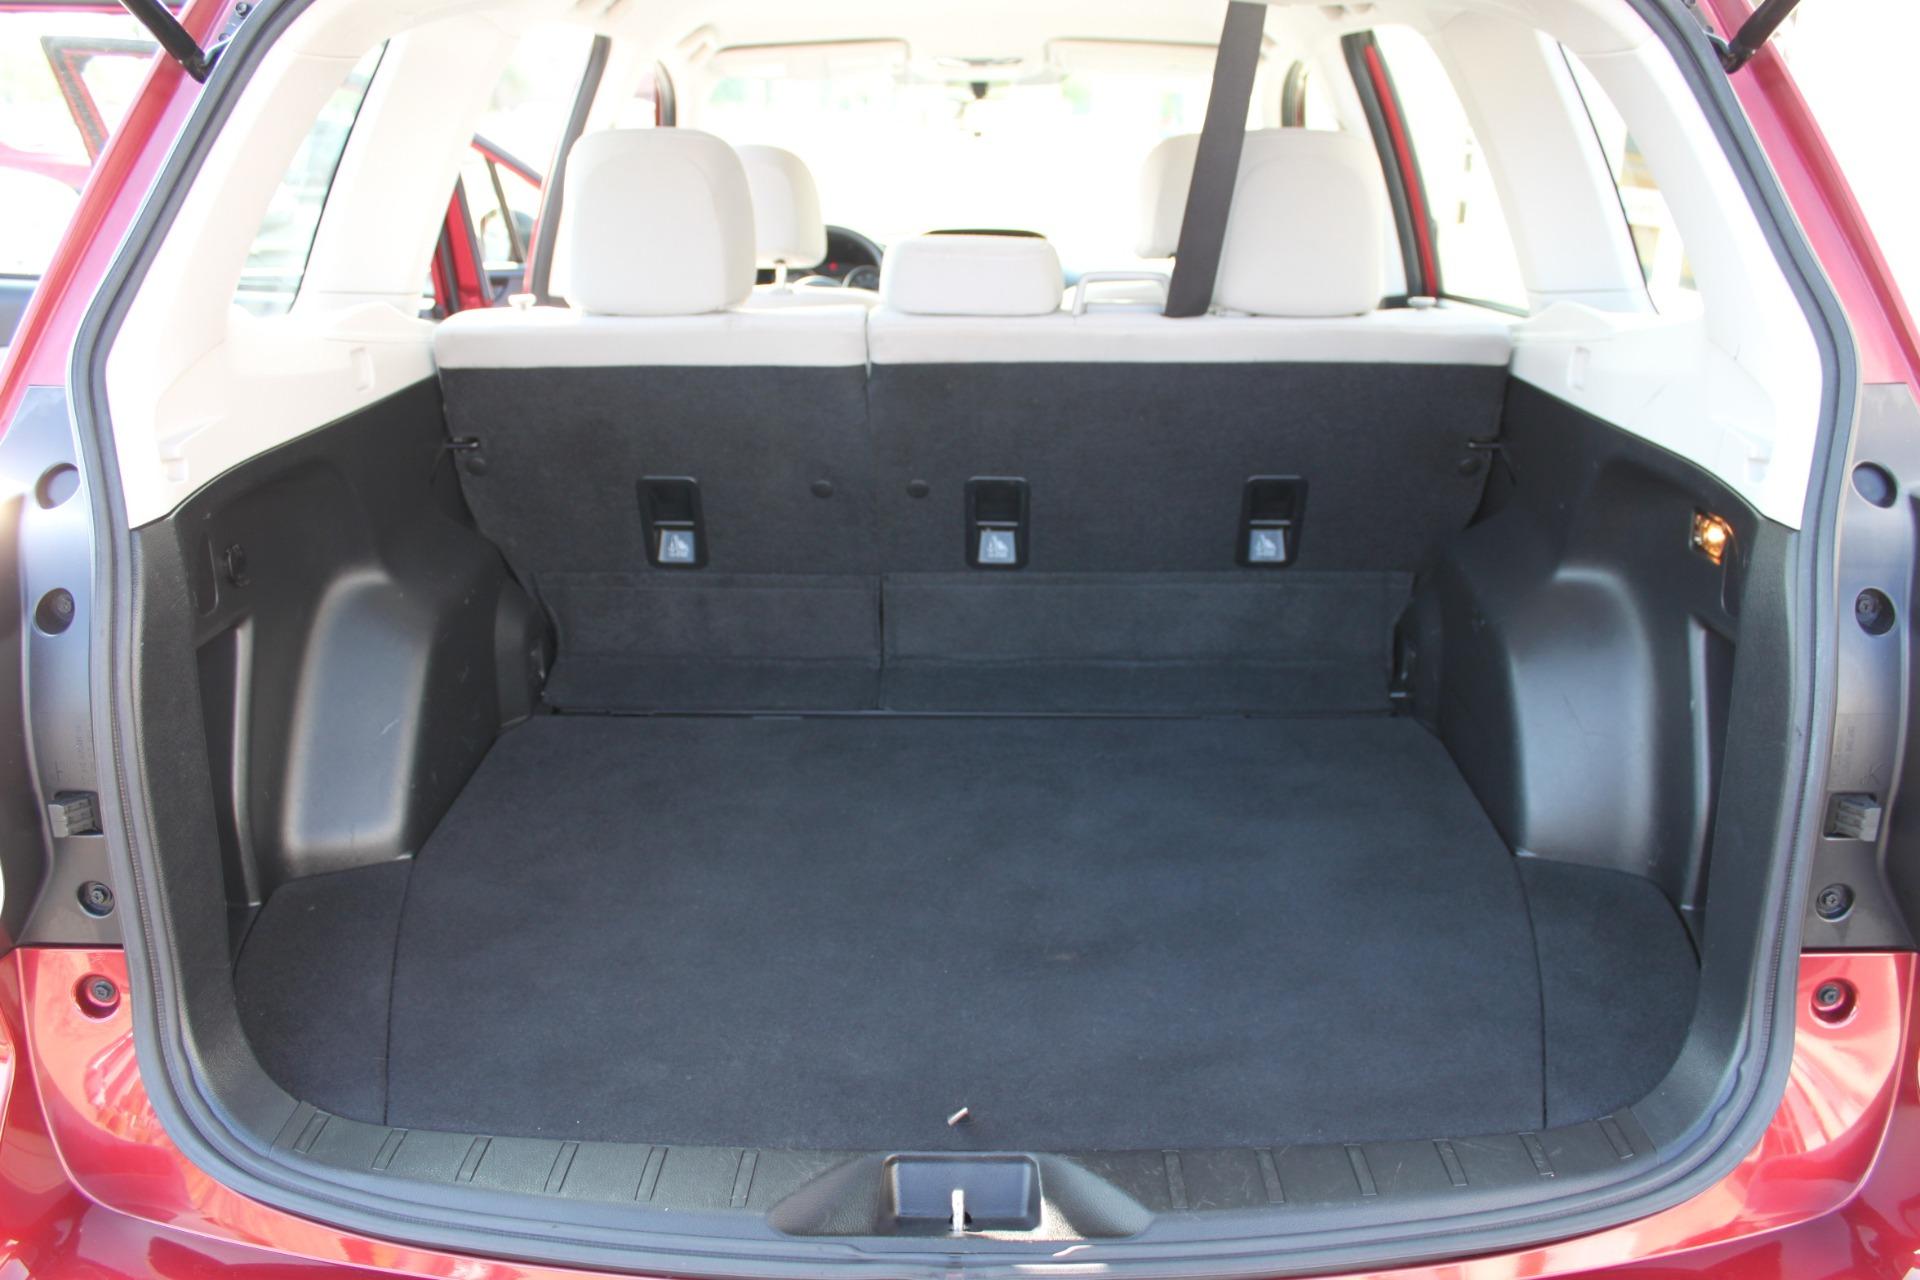 Used-2017-Subaru-Forester-25i-All-Wheel-Drive-25i-Chevrolet